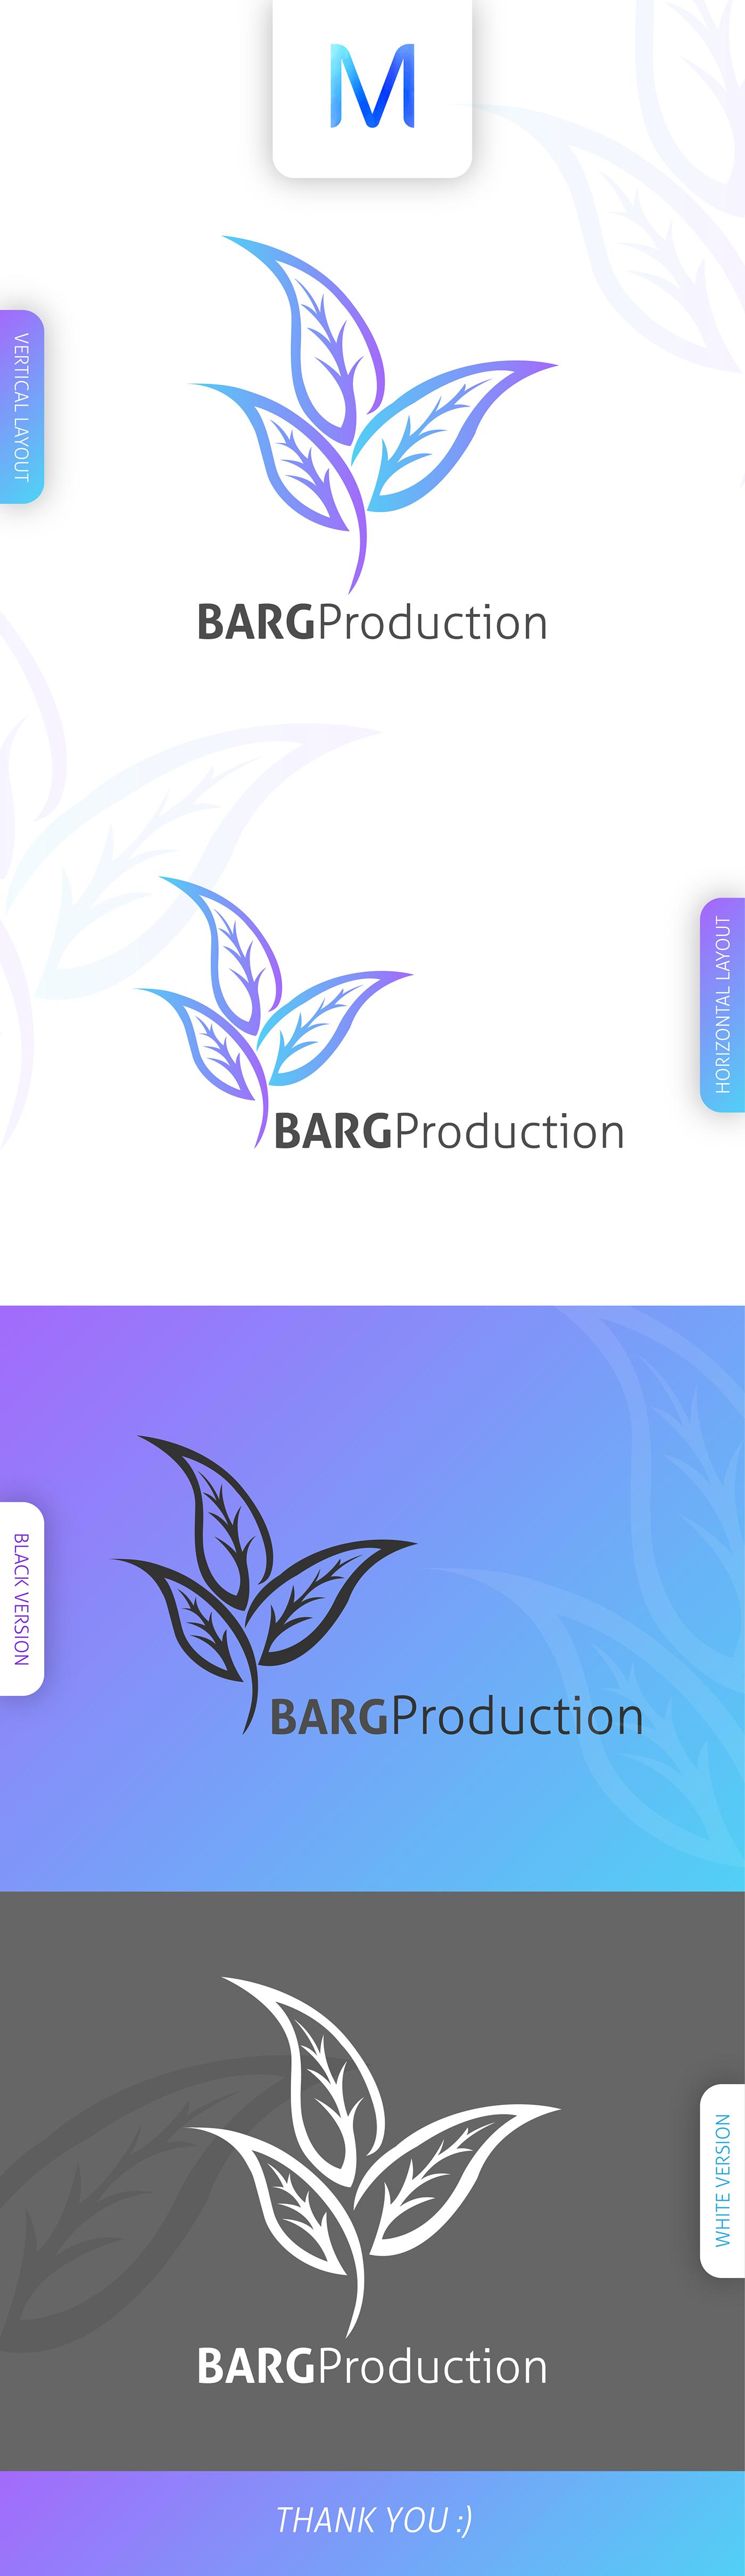 Production,graphic design ,ILLUSTRATION ,flat design